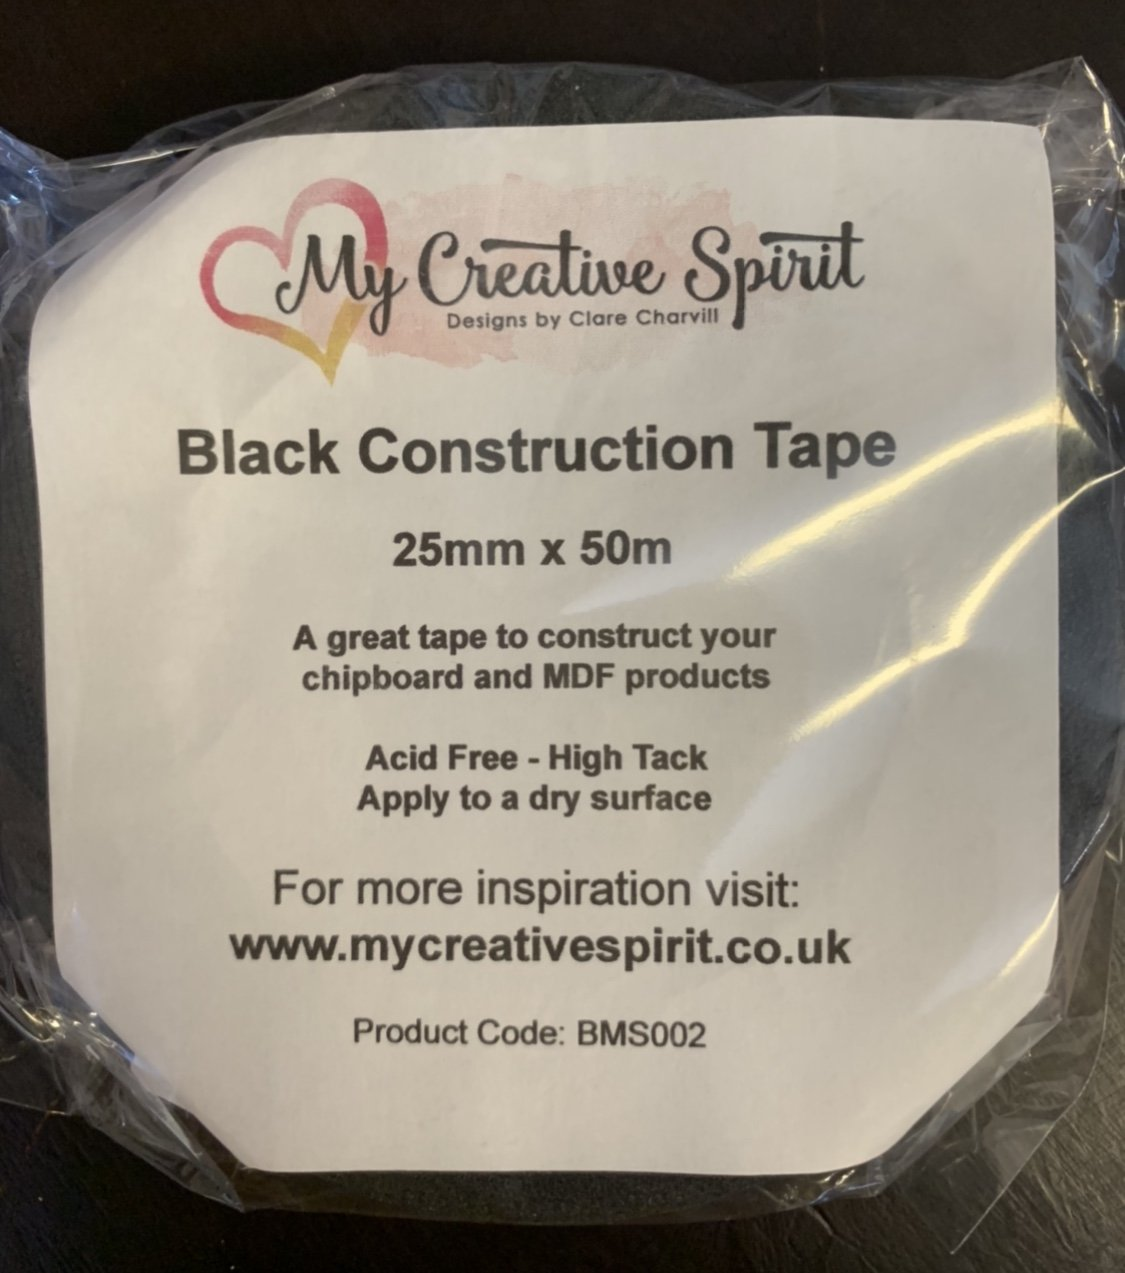 Black Construction Tape 25mm x 50m